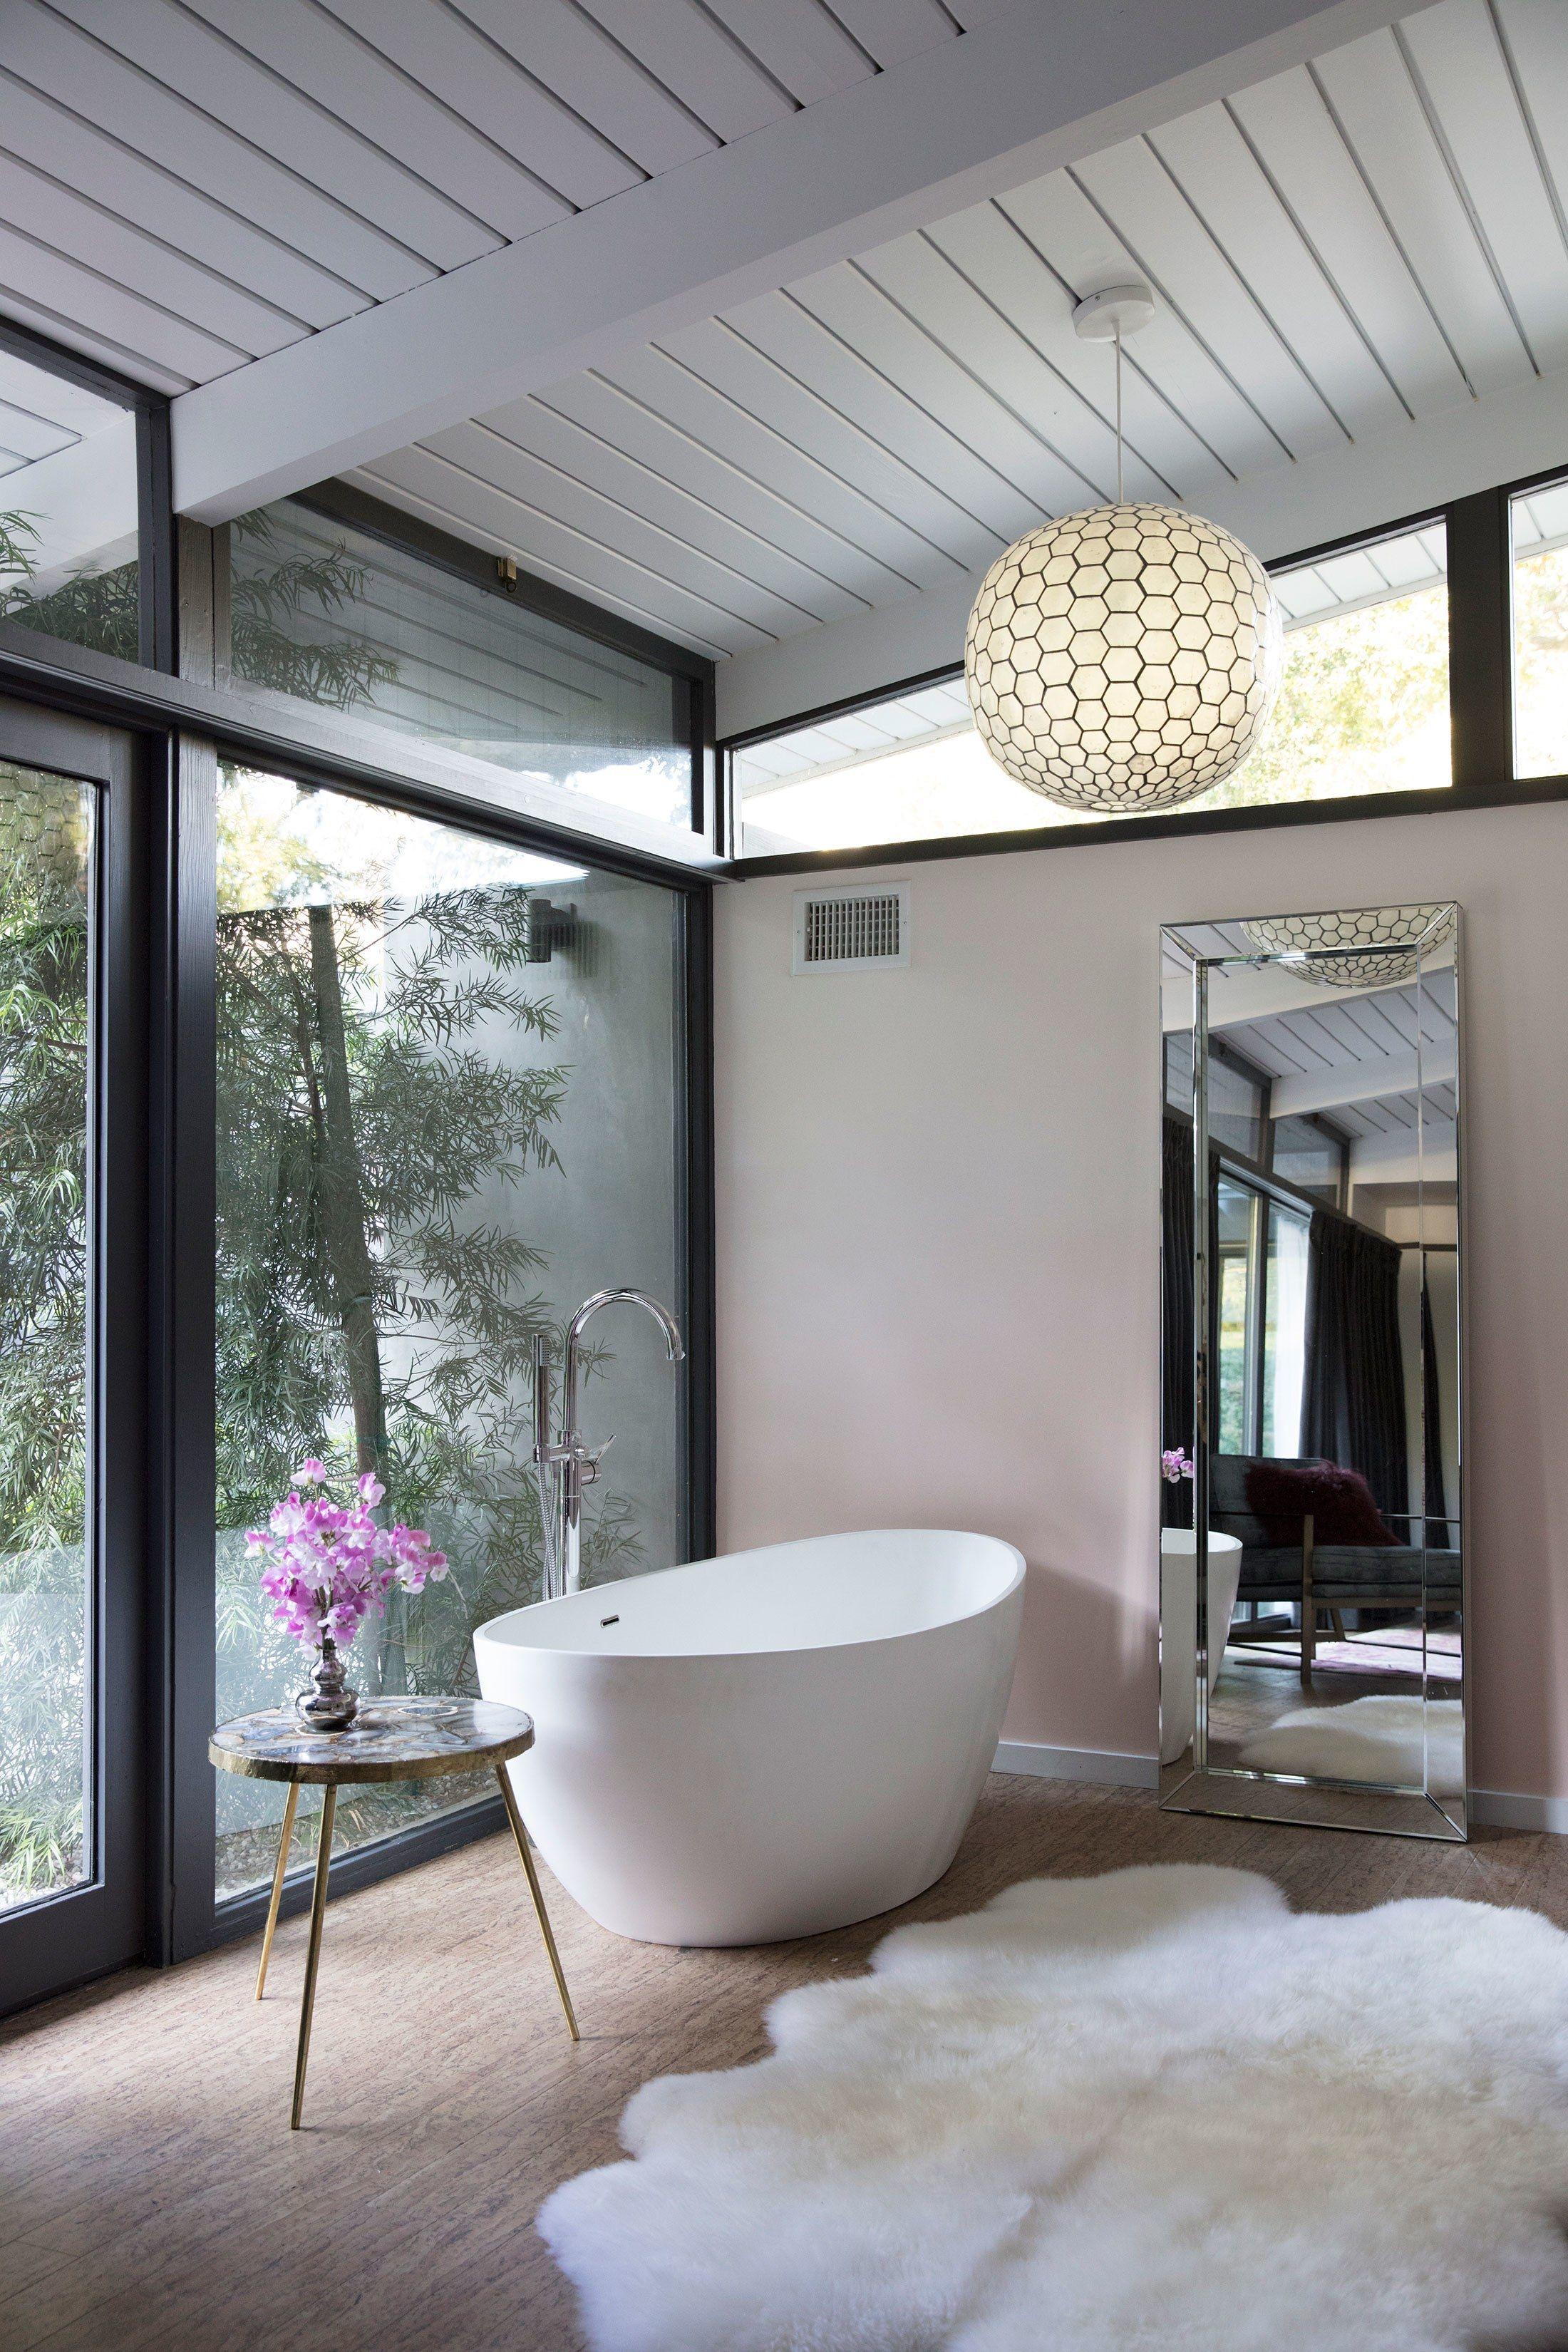 Master bedroom without bathroom  Laura Dernus Modern Forest Retreat  Architectural digest Dream